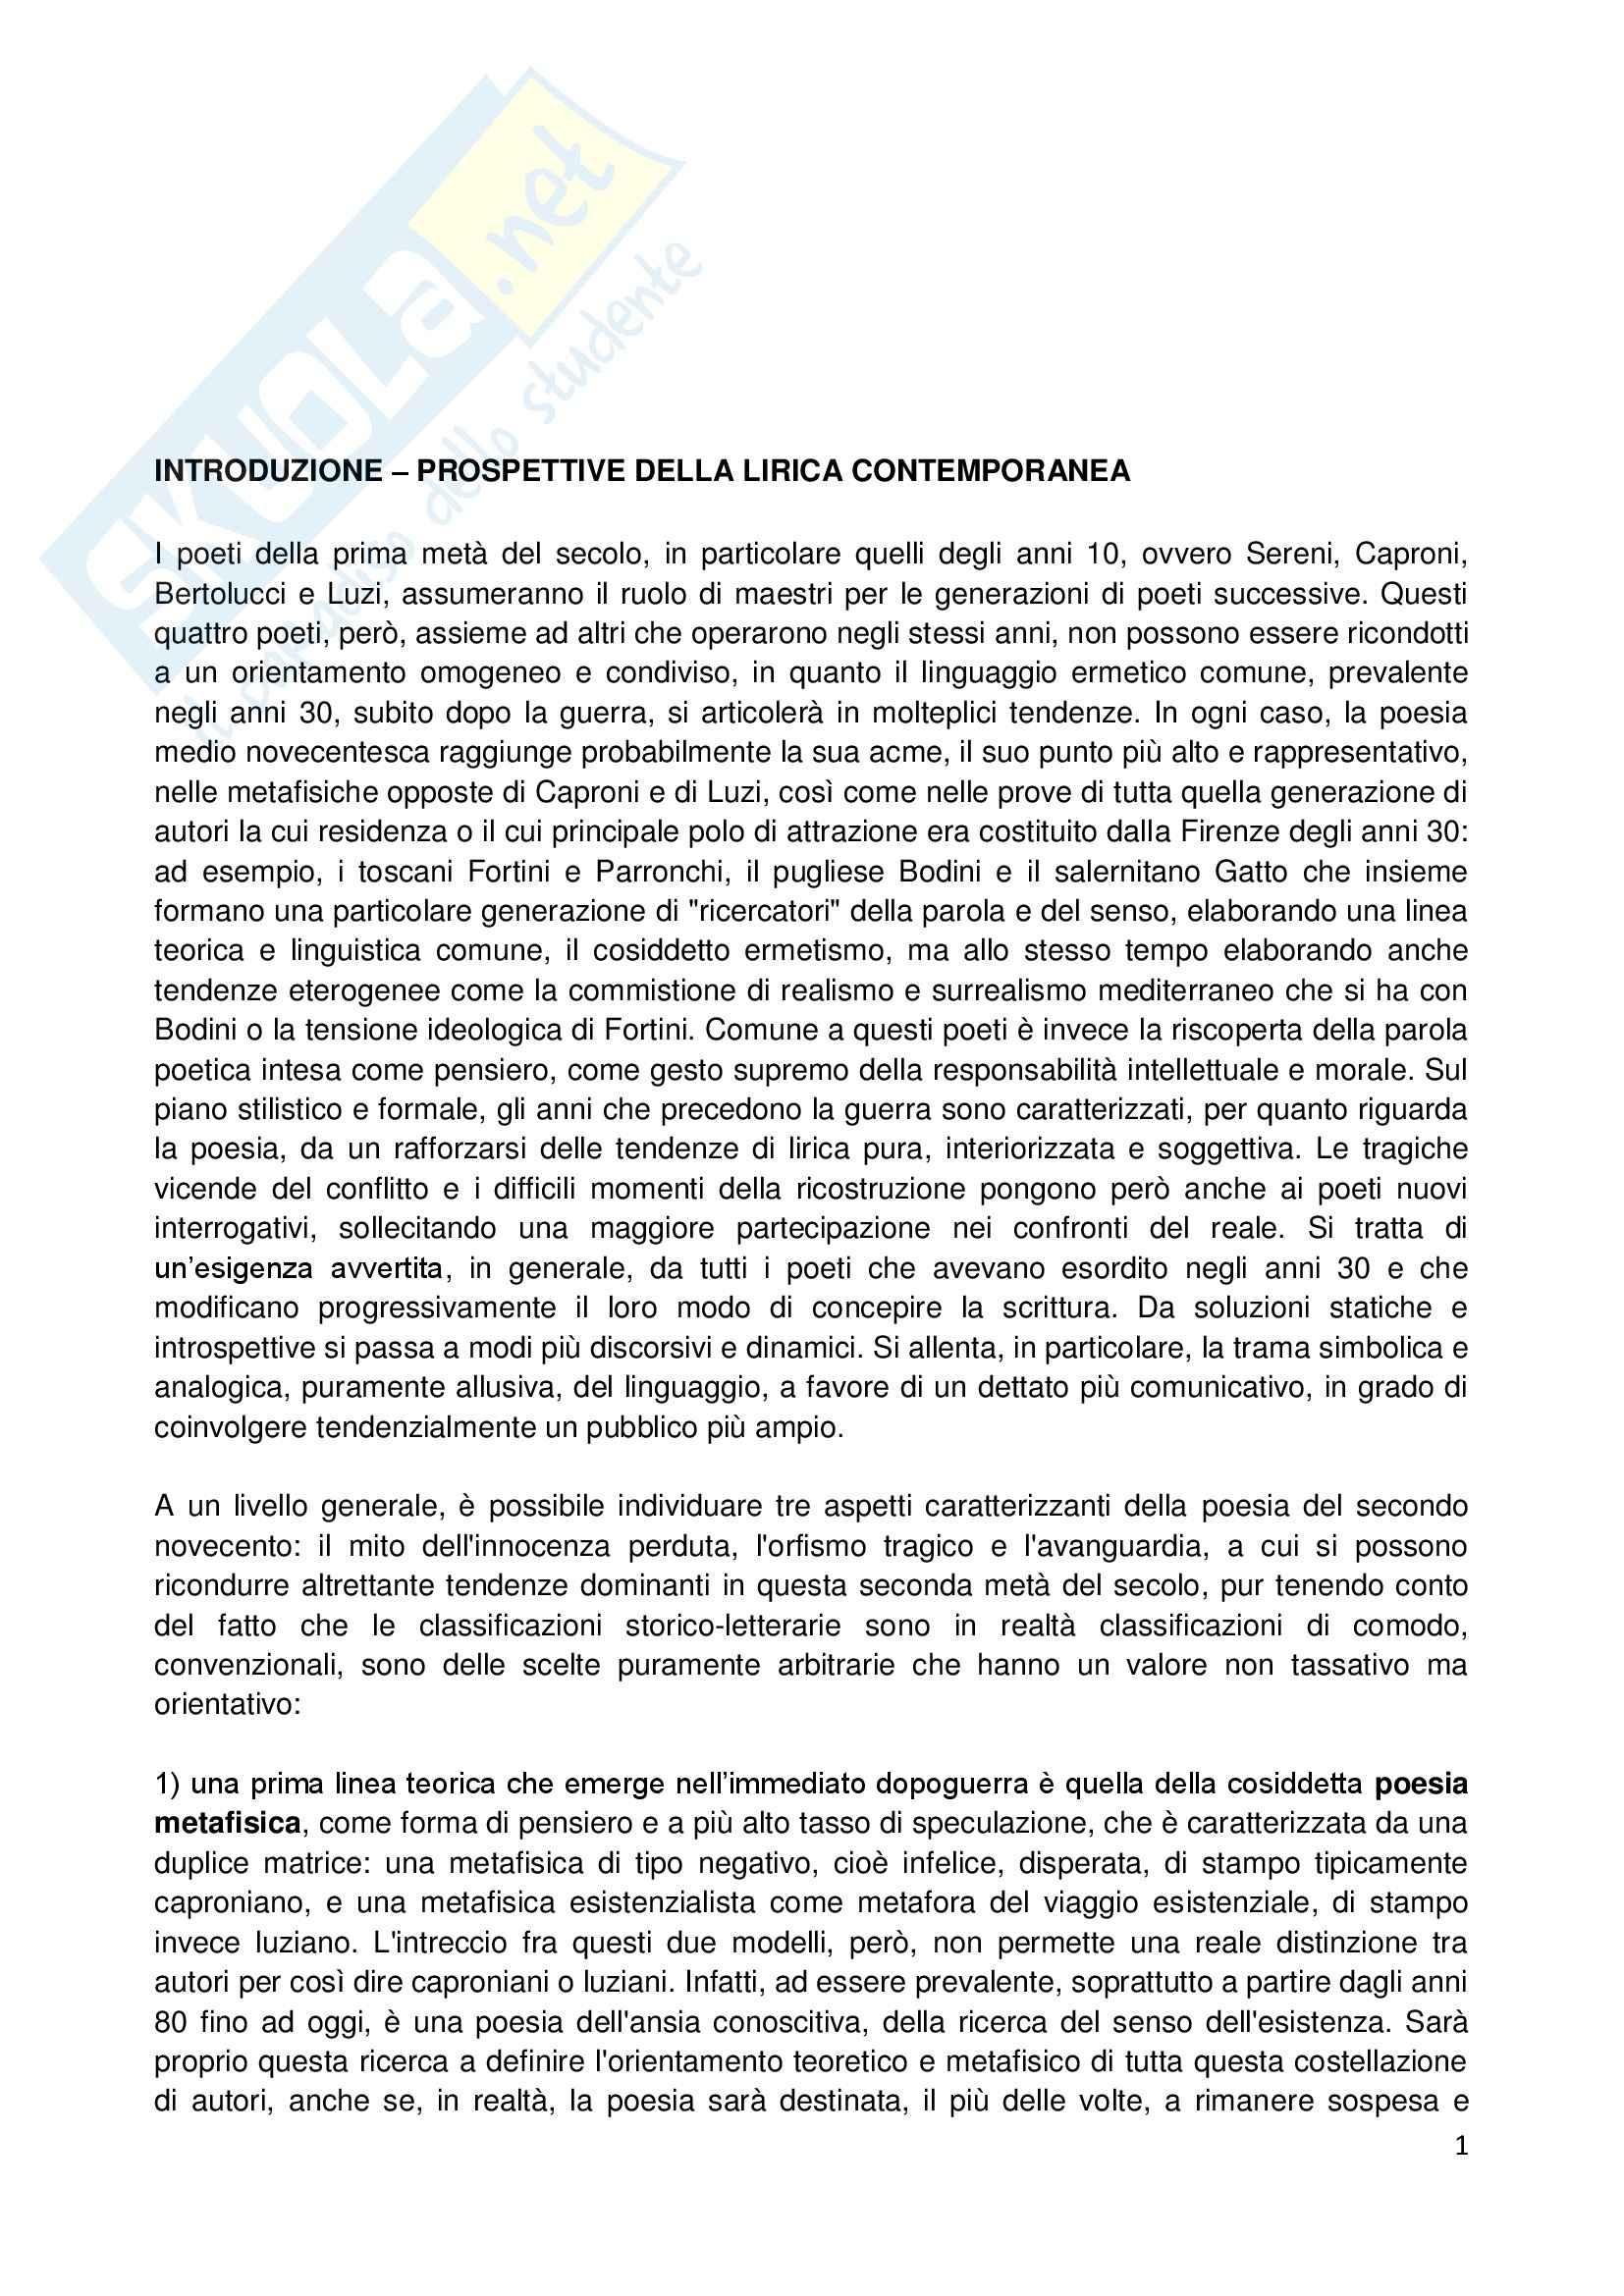 appunto D. Pegorari Letteratura italiana contemporanea